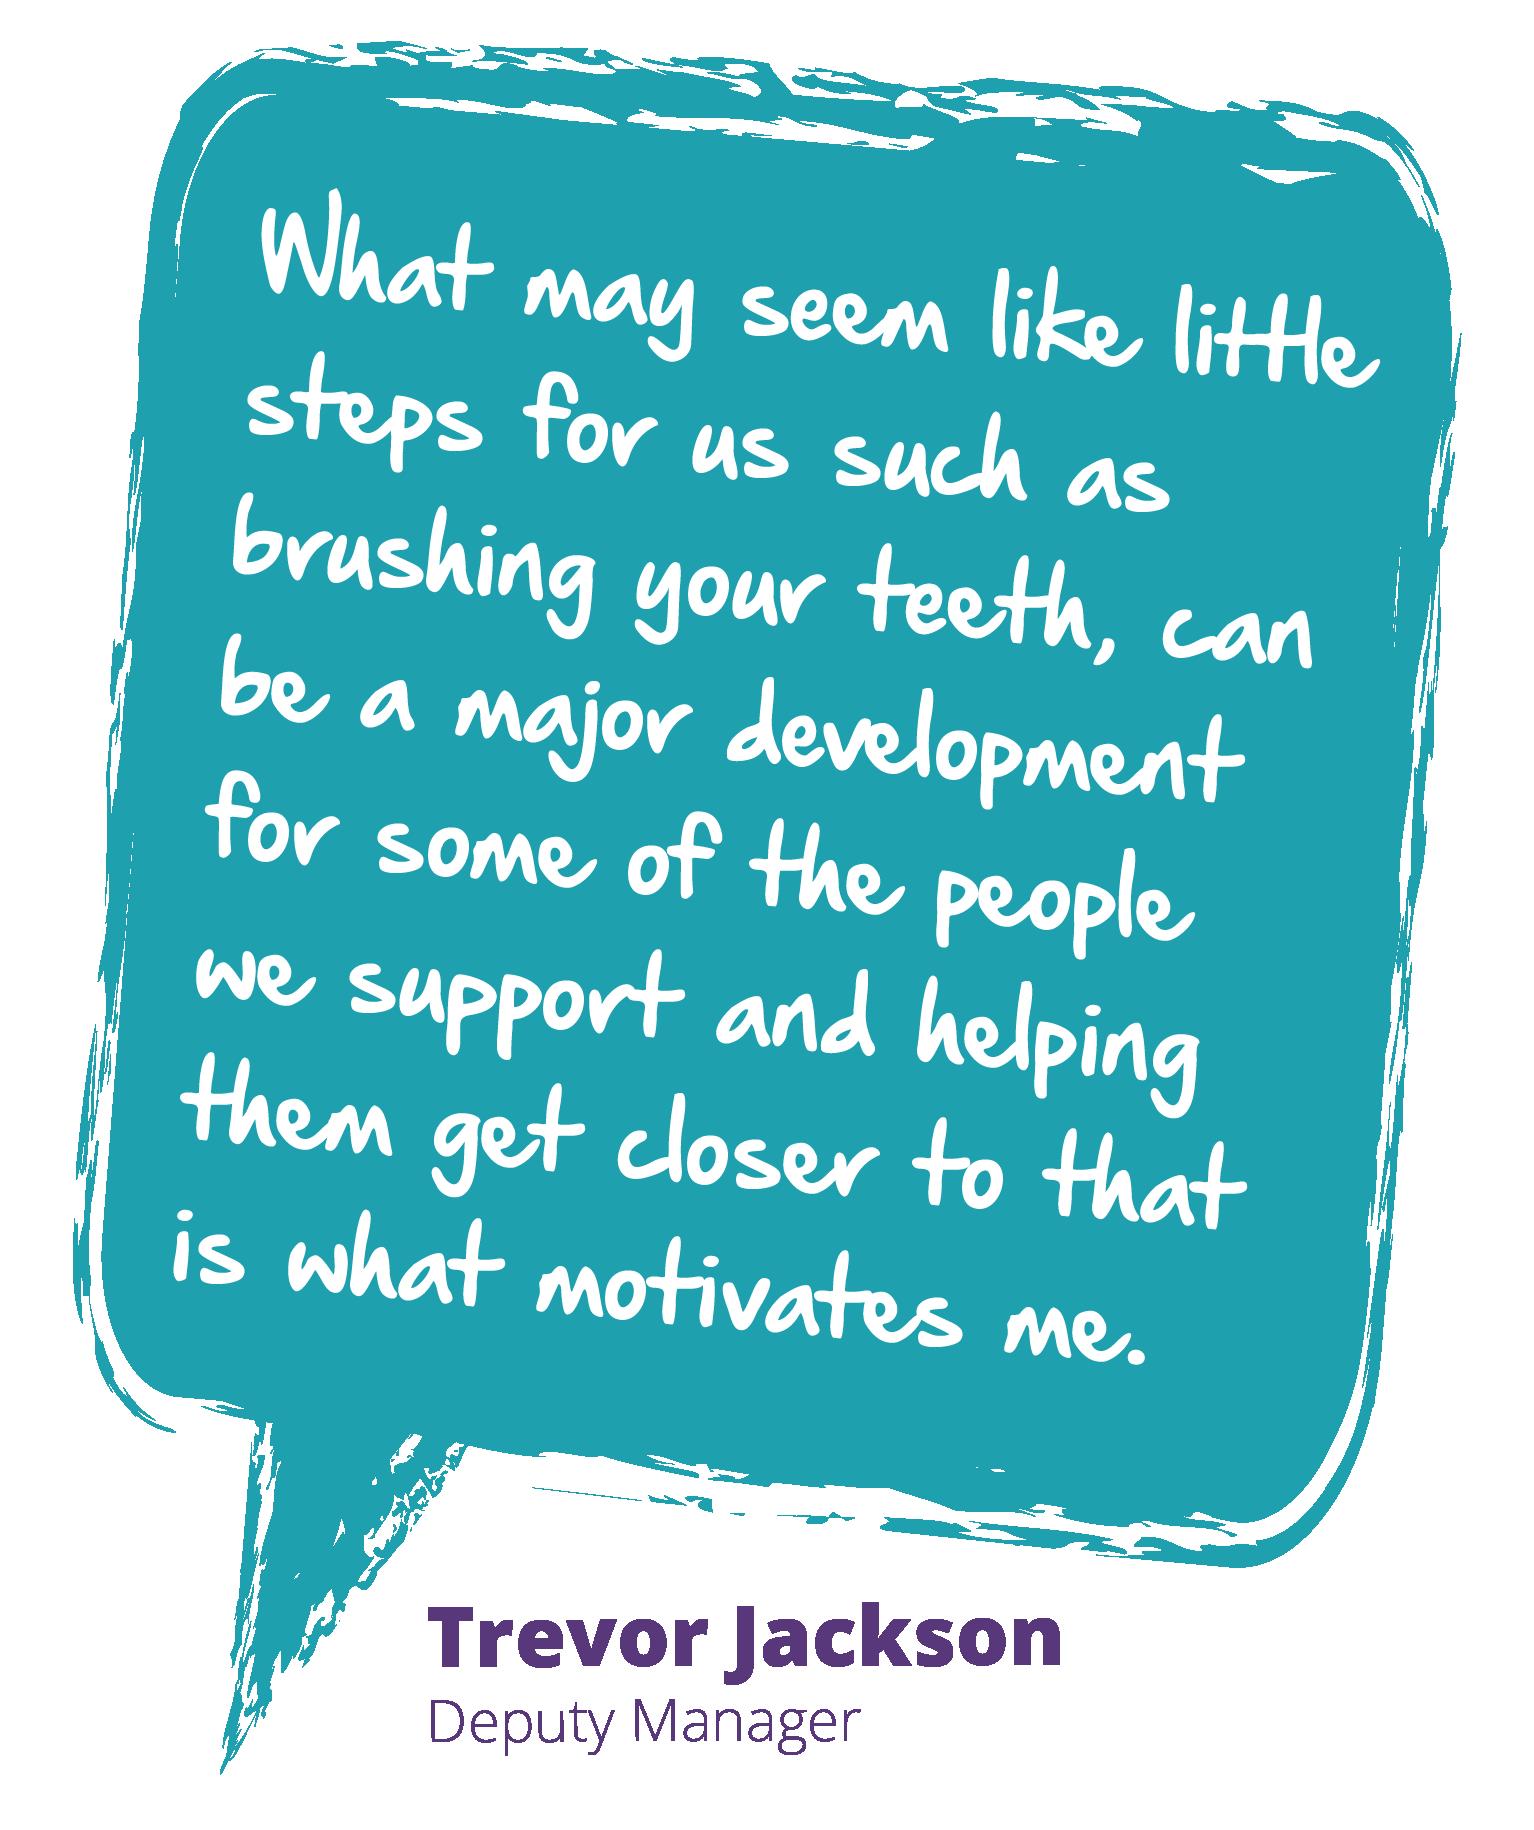 Testimonial: Trevor Jackson, deputy manager